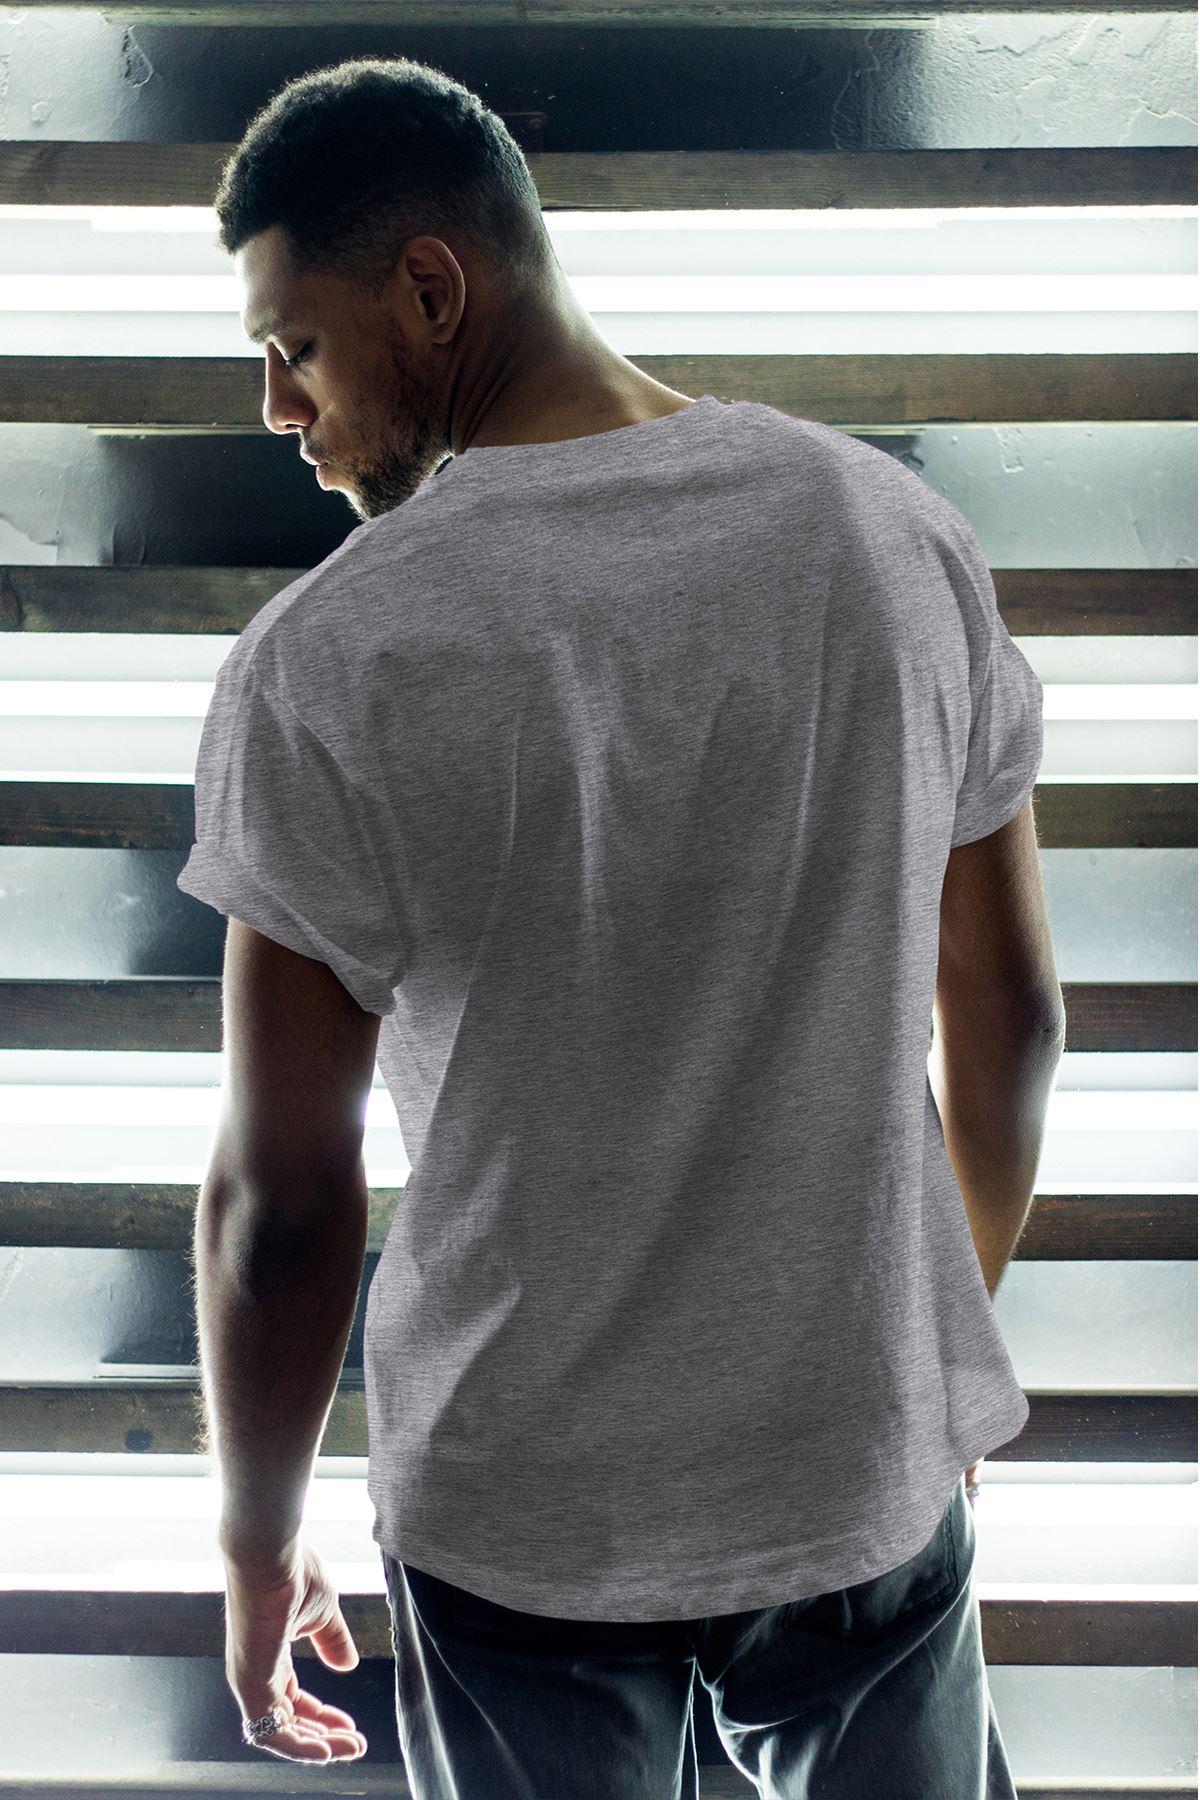 Boston Celtics 25 Gri Erkek Oversize Tshirt - Tişört